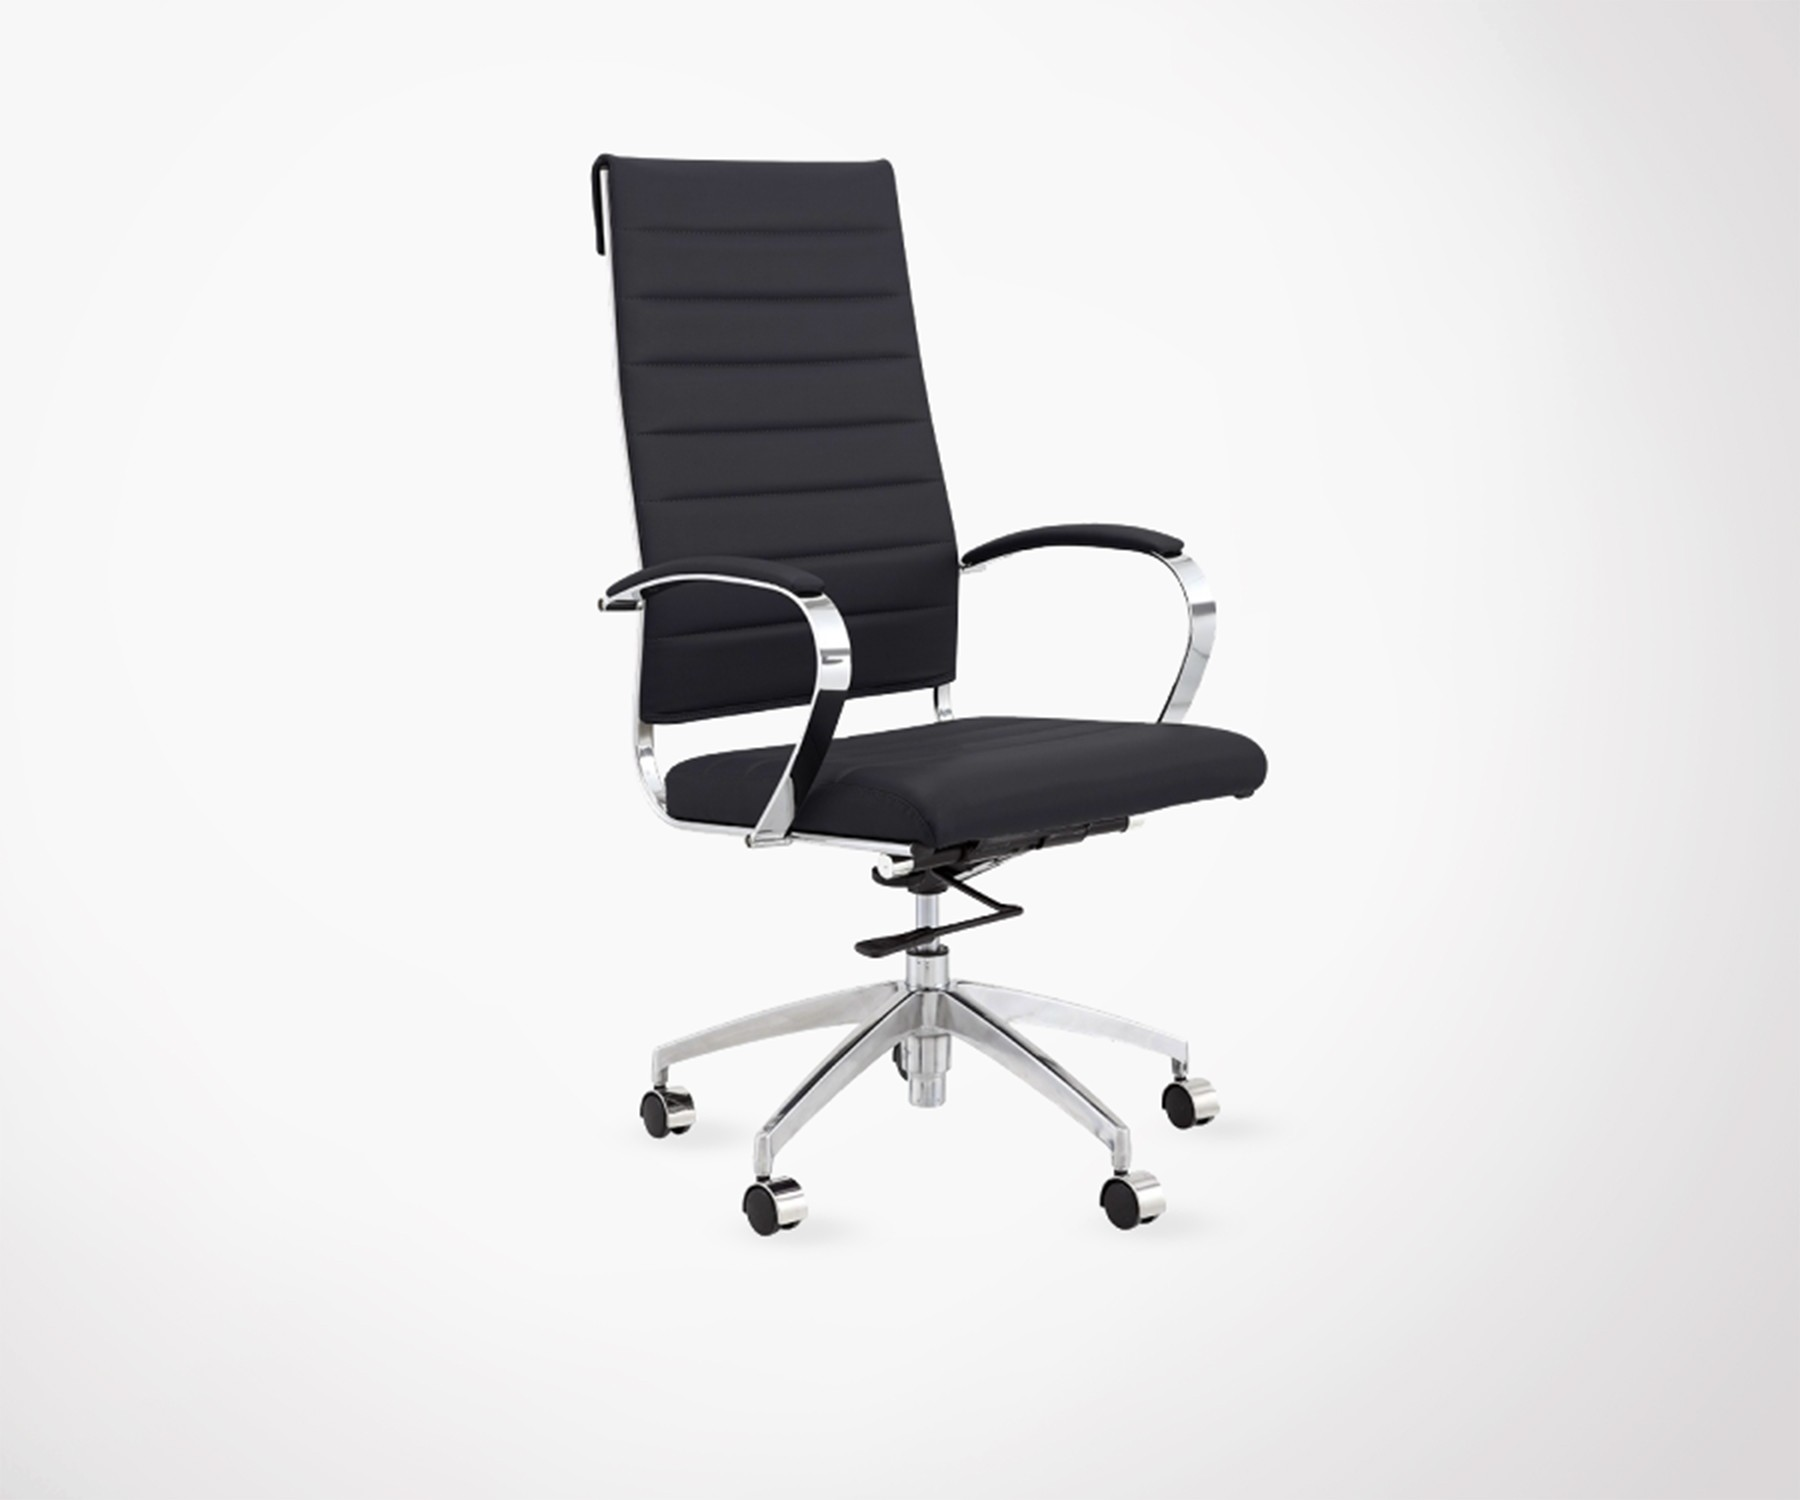 Chaise De Bureau Design Scandinave Esprit CharlesE